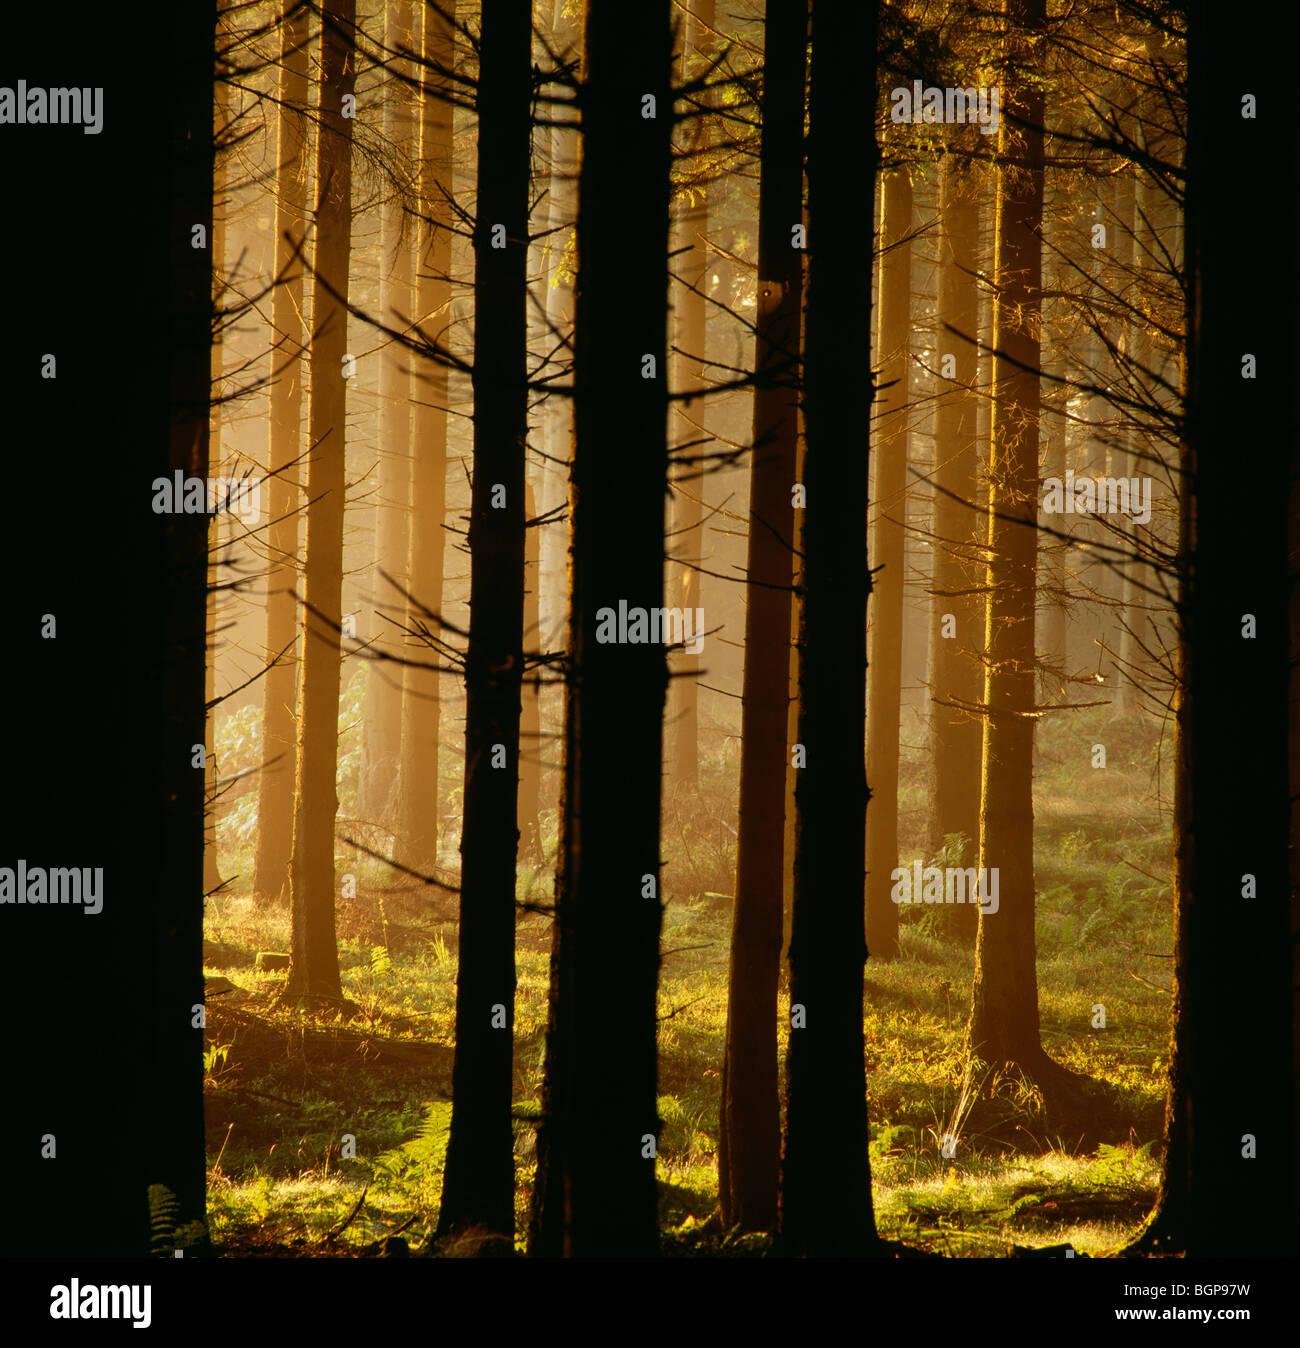 Spruce forest, Jutland, Denmark. - Stock Image